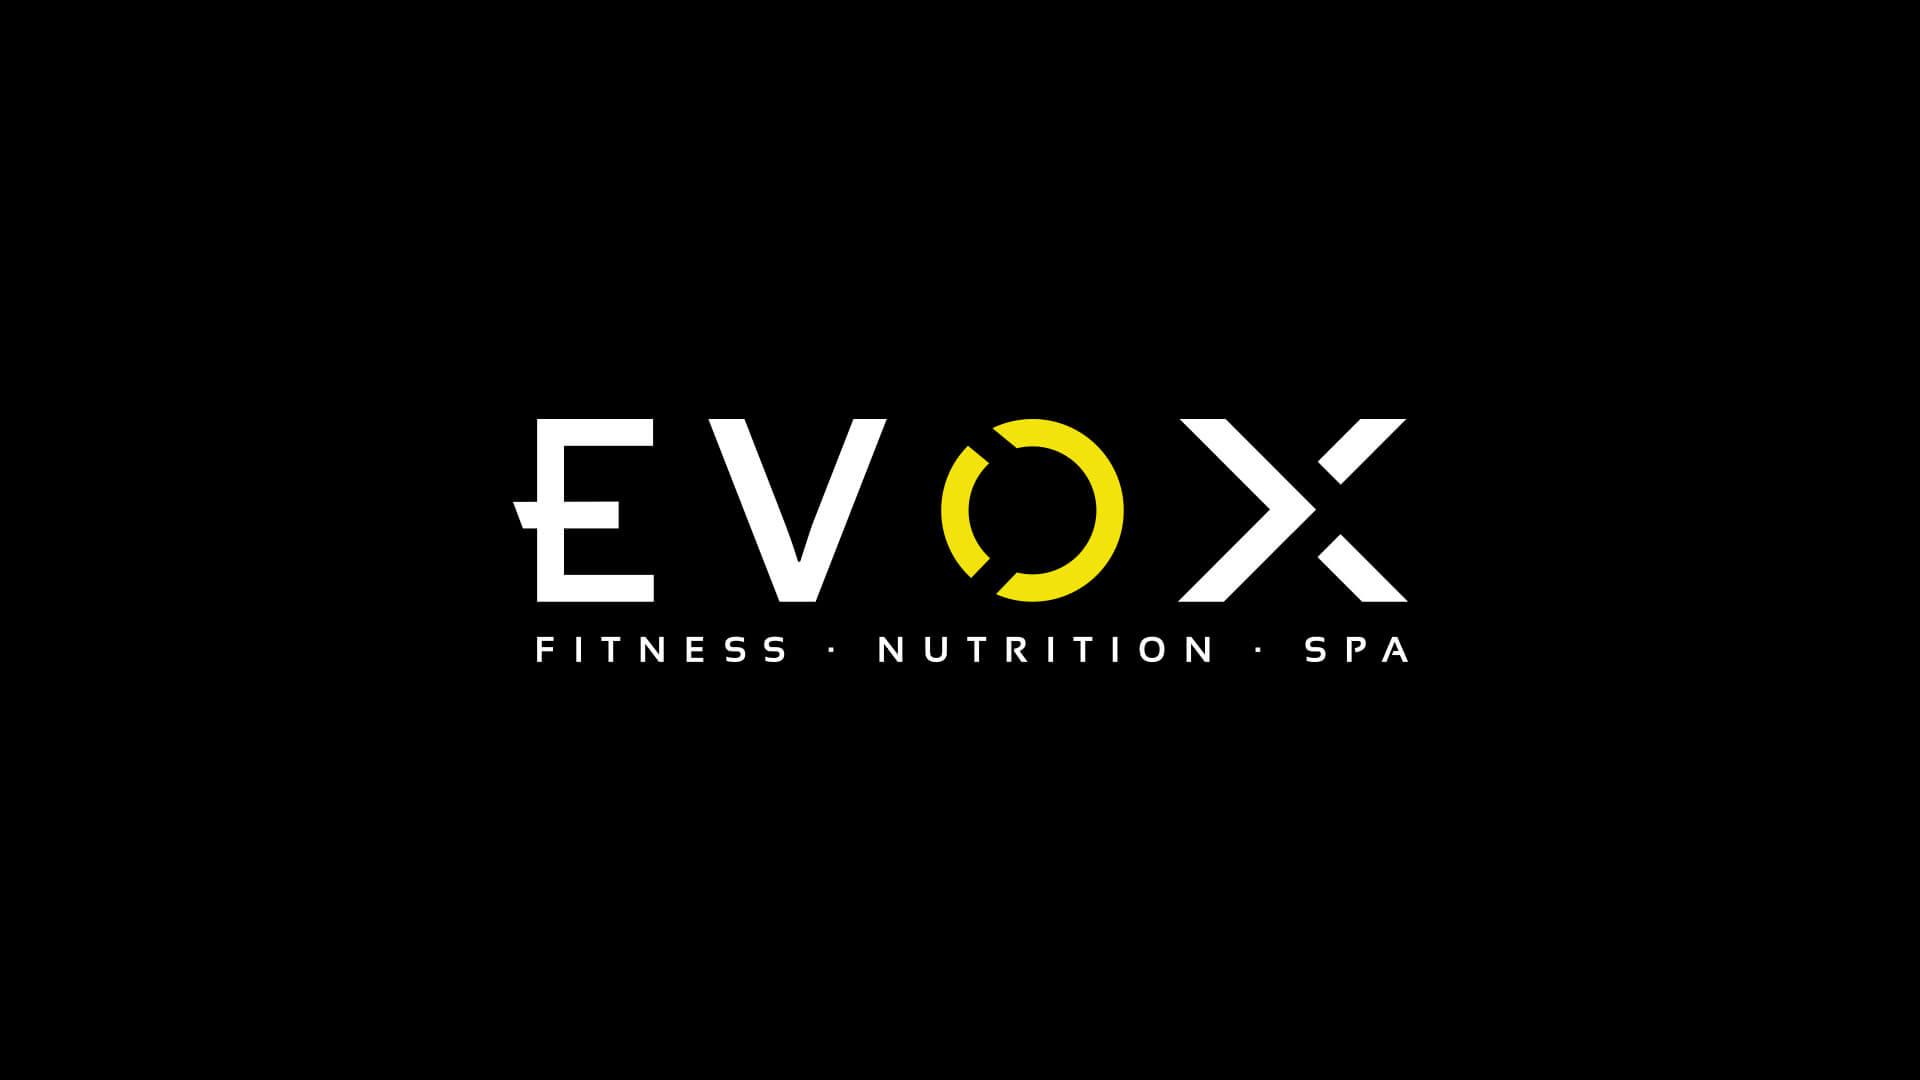 Evox Fitness Concept